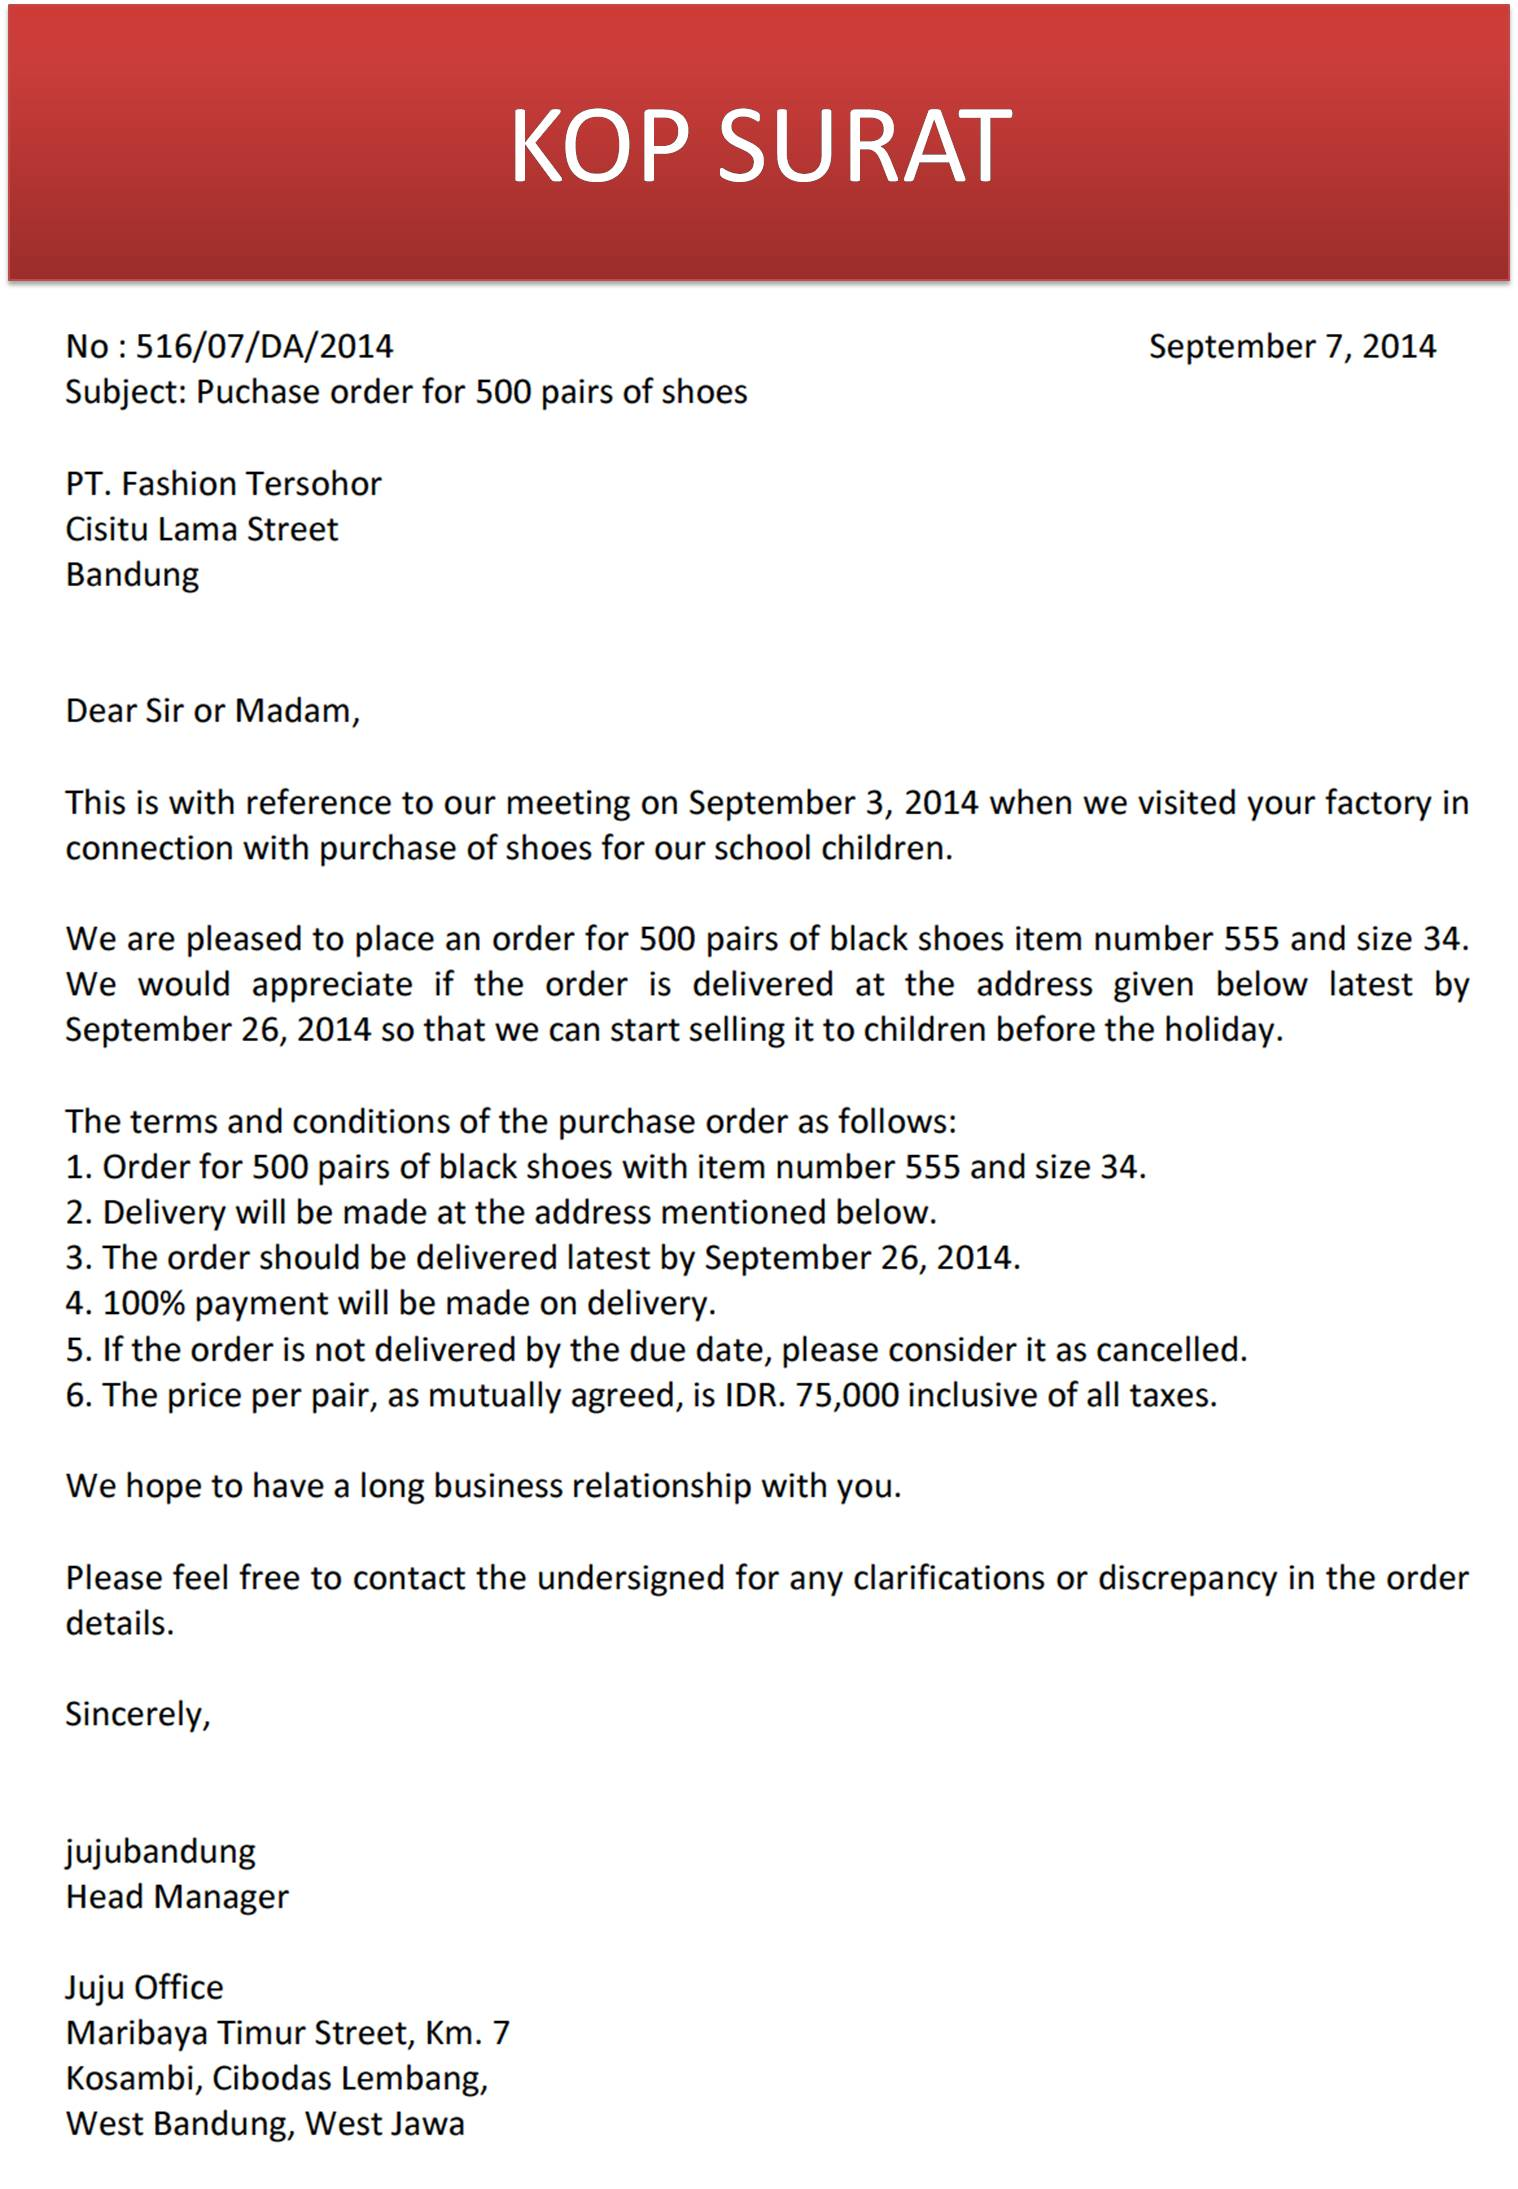 Surat Pemesanan Bahasa Inggris Order Letter Jujubandung